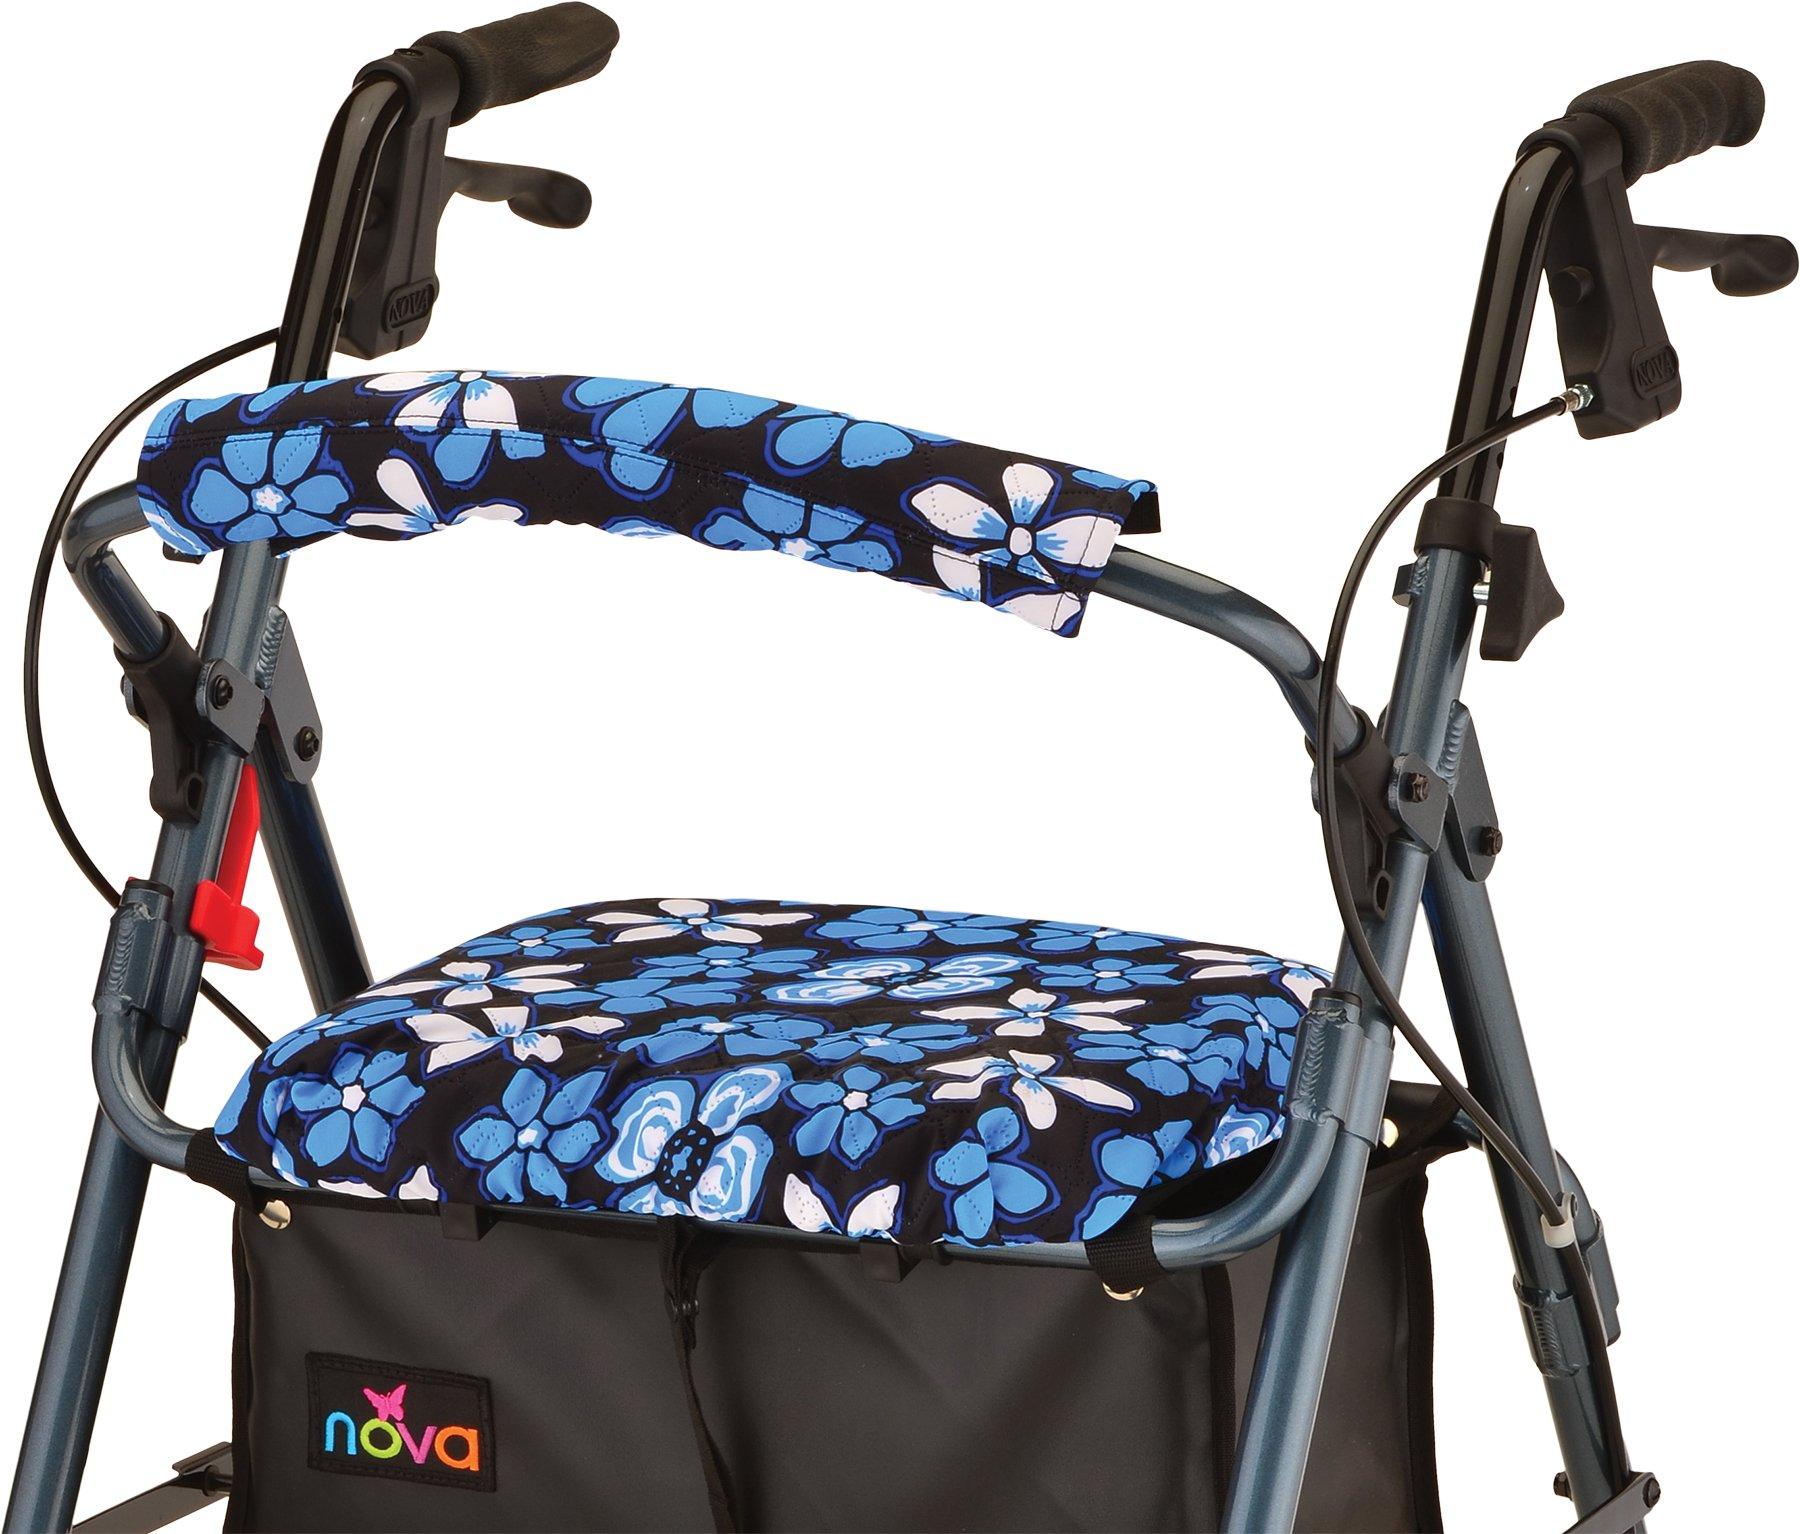 NOVA Medical Products Seat & Back Cover, Aloha Blue, 0.45 Pound